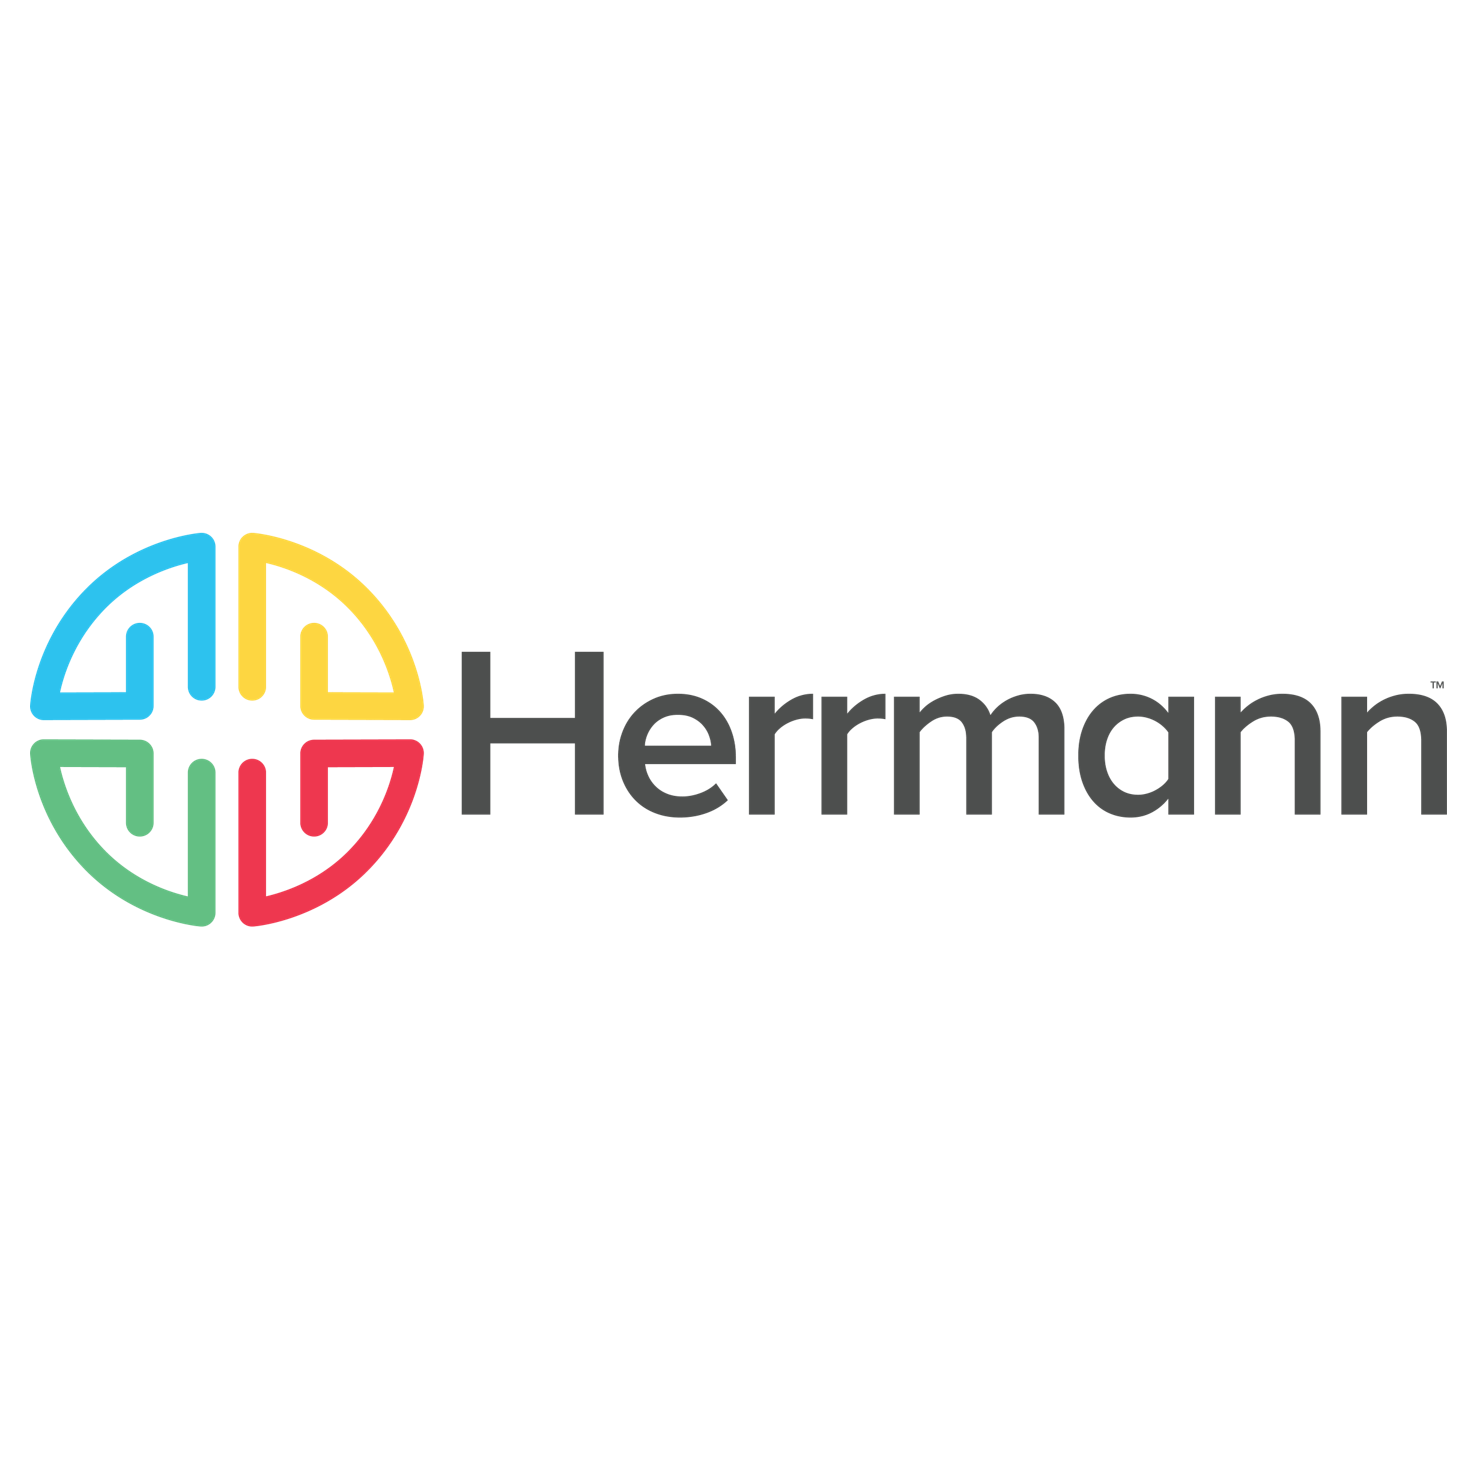 logo hbdi 2